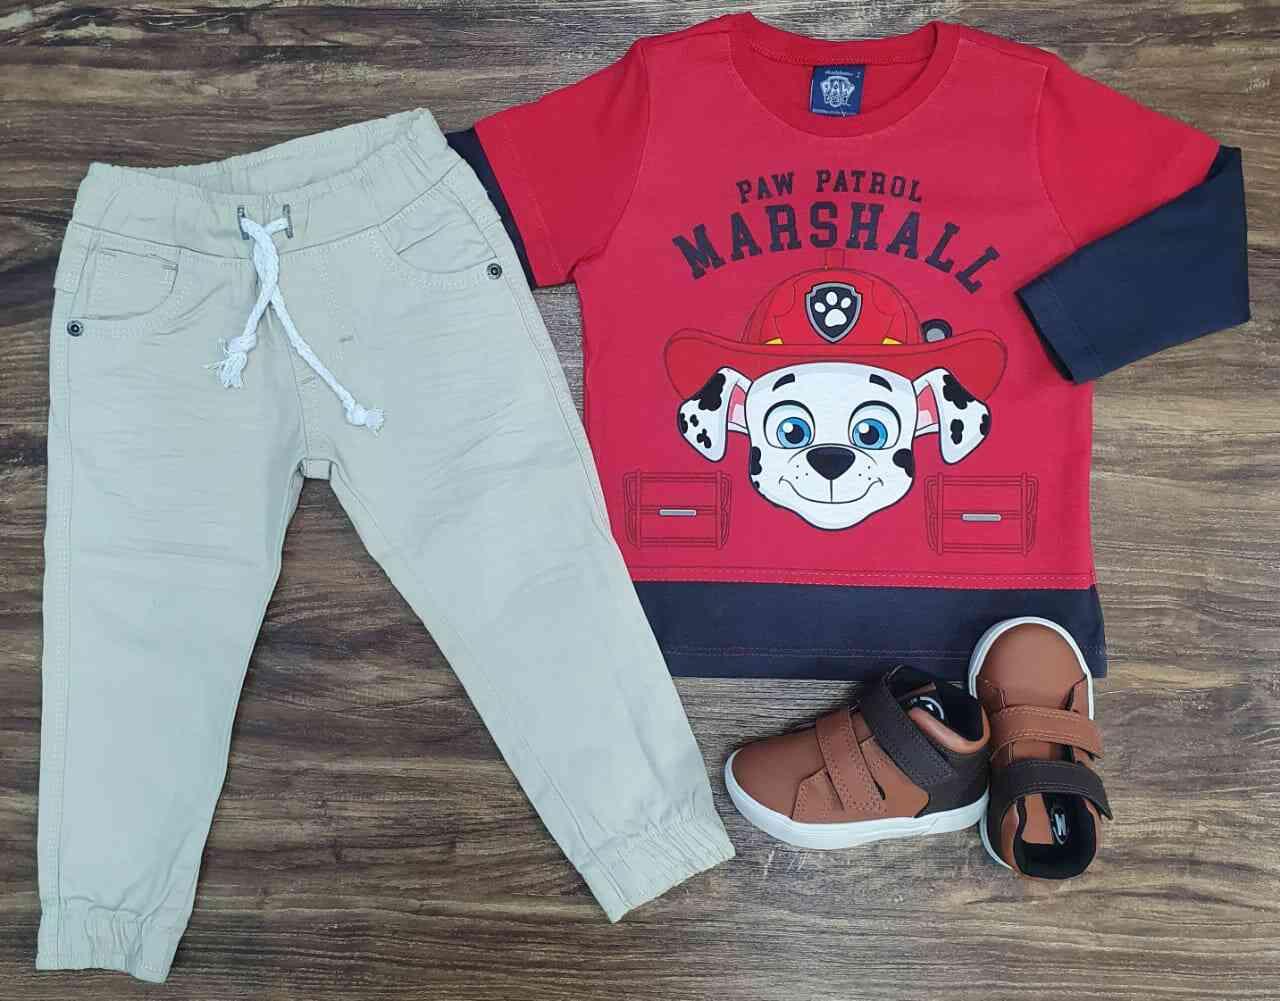 Calça Jogger com Camiseta Patrulha Canina Infantil